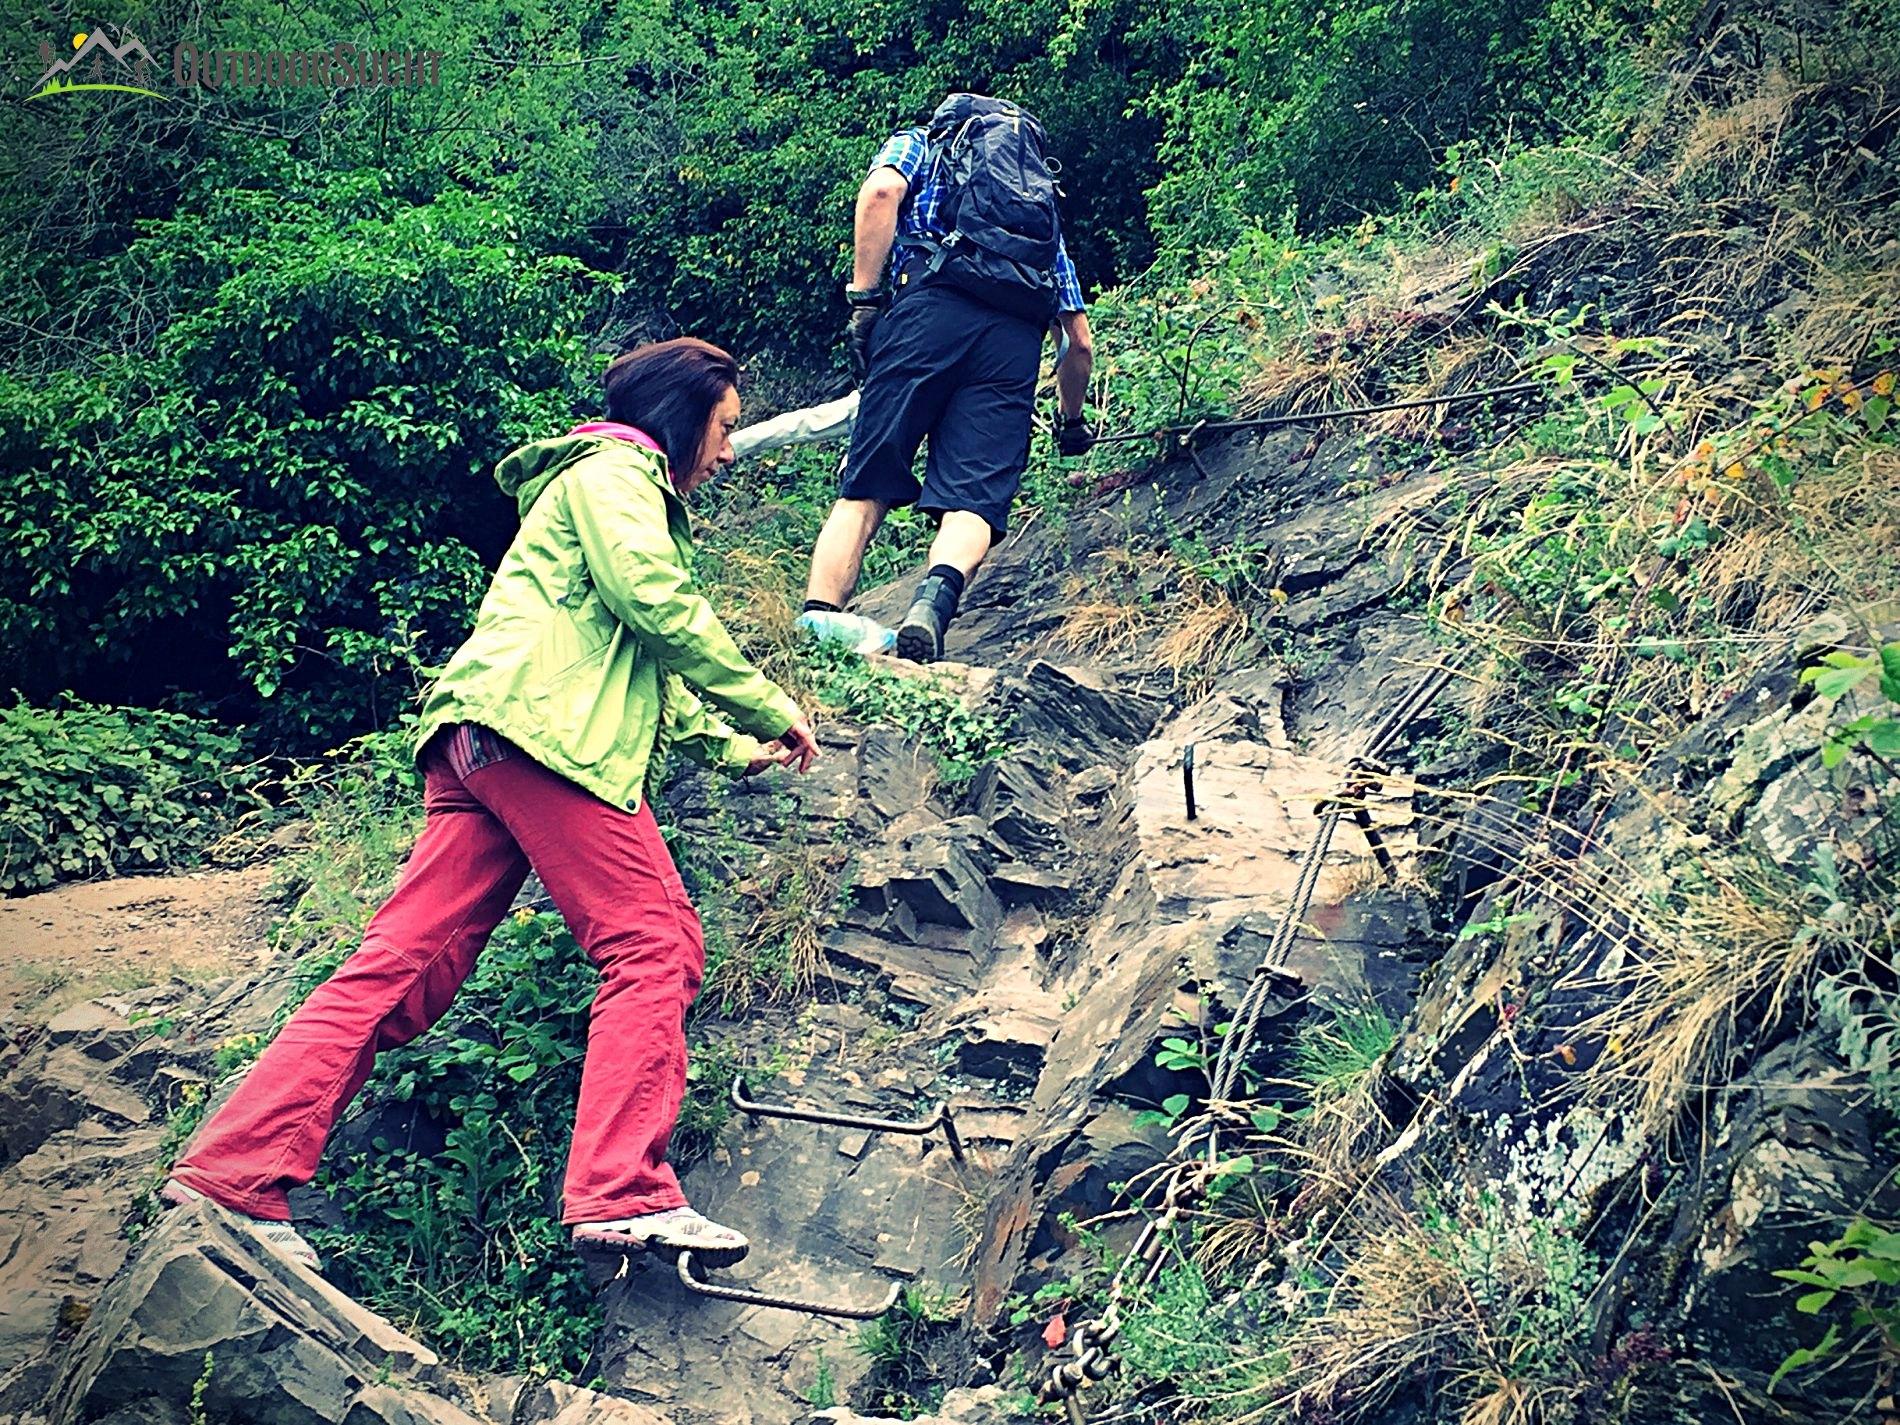 Klettersteig Calmont : Calmont klettersteig moselsteig outdoorsucht